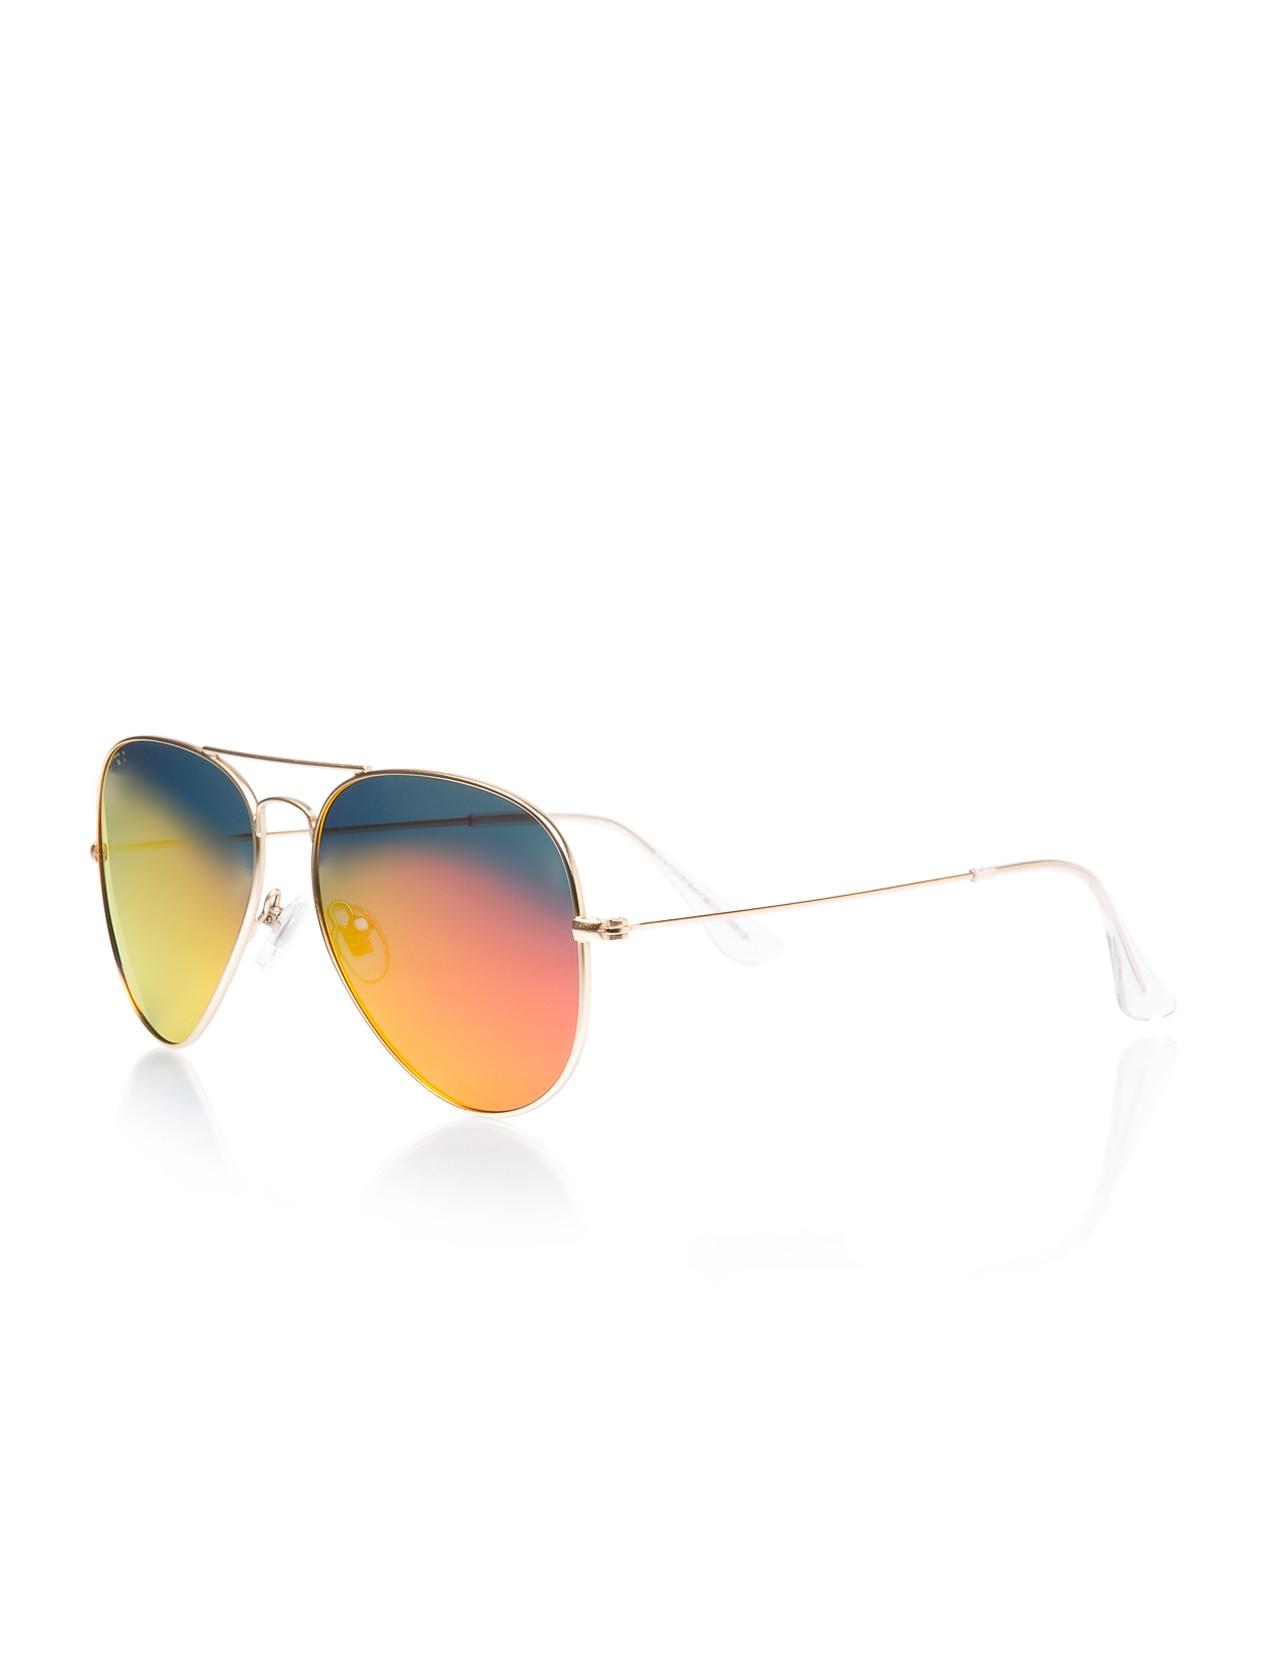 Unisex sunglasses sw 3609 04 flat 02 metal yellow unspecified 58-swing